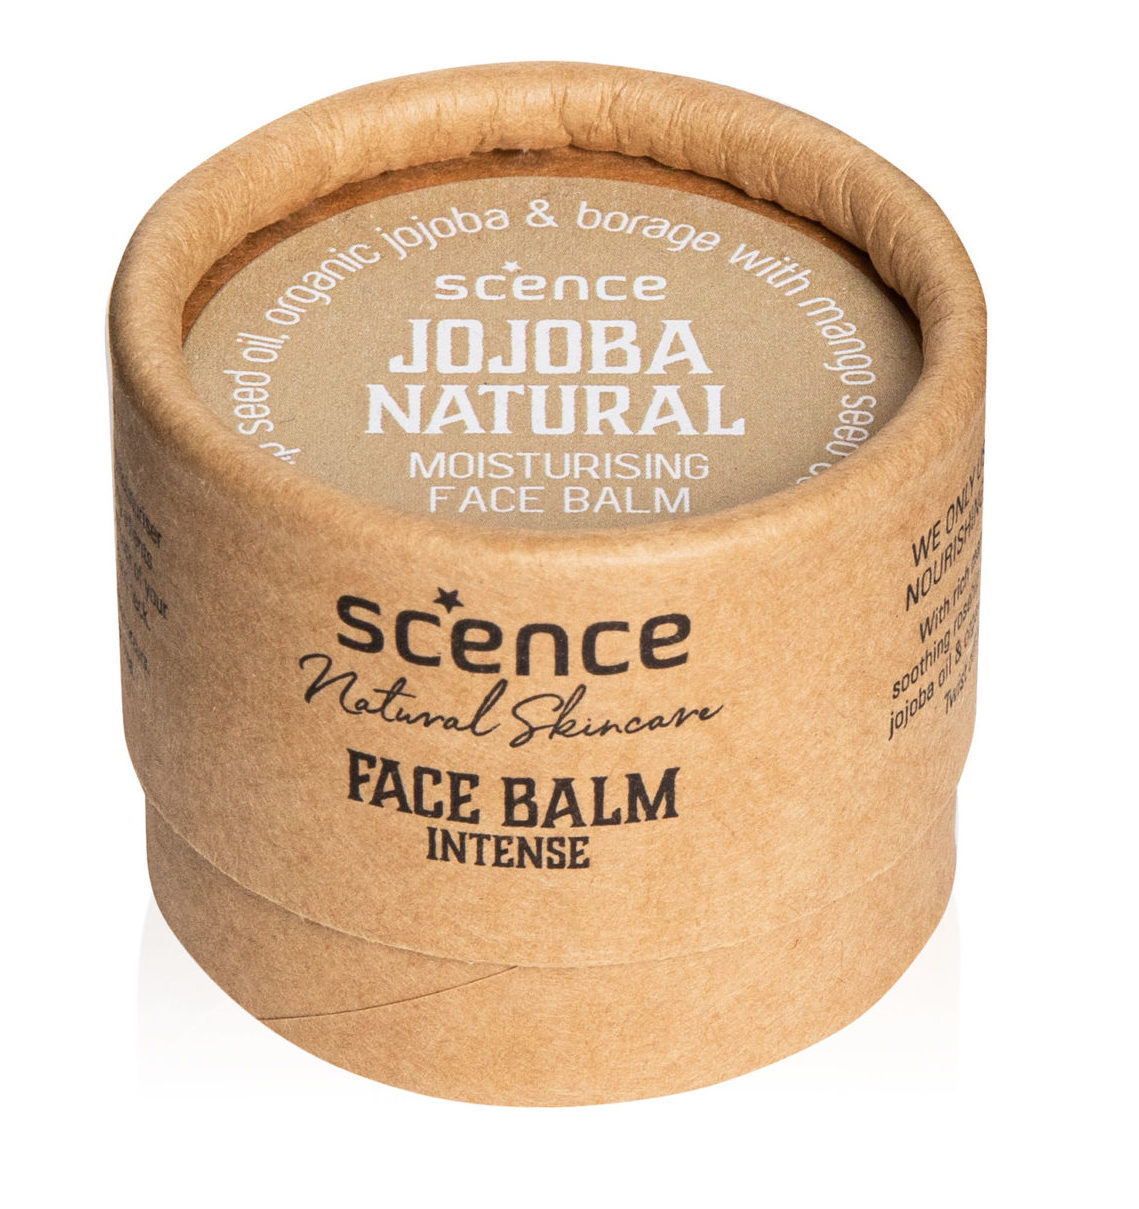 Scence Natural Face Balm